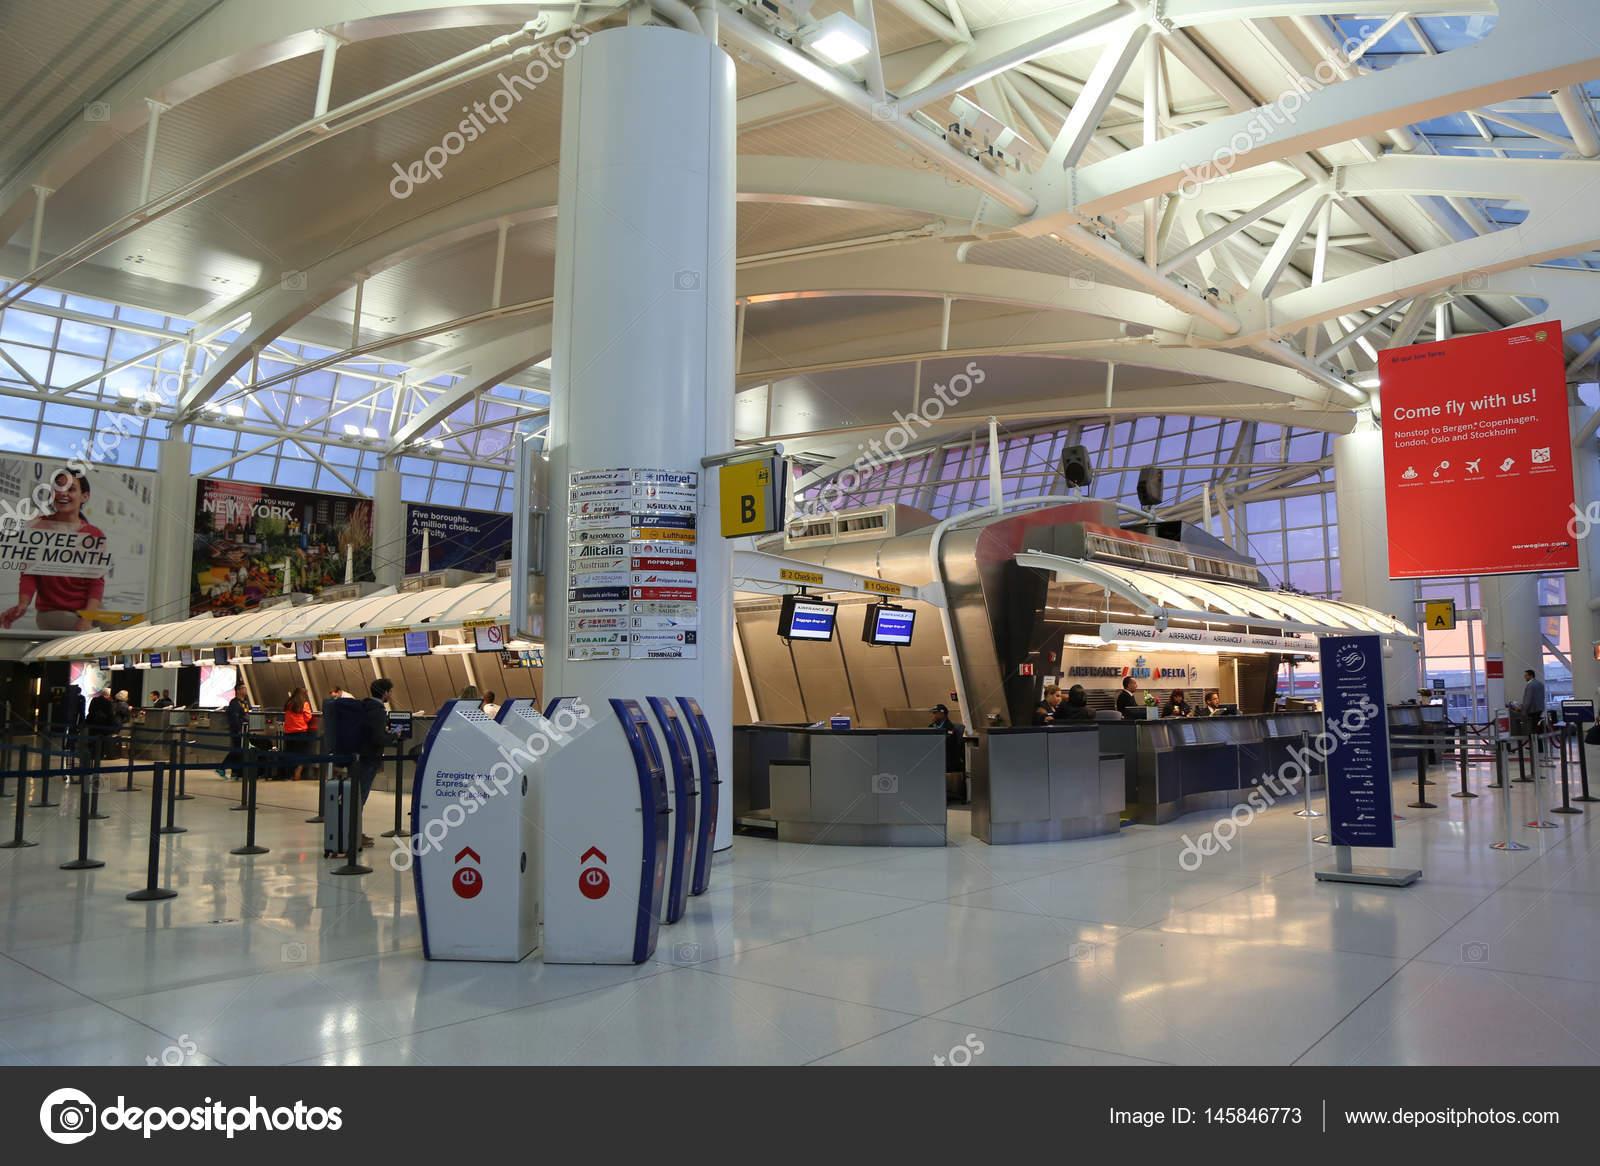 Aeroporto Jfk : Inside of terminal 1 at jfk international airport in new york